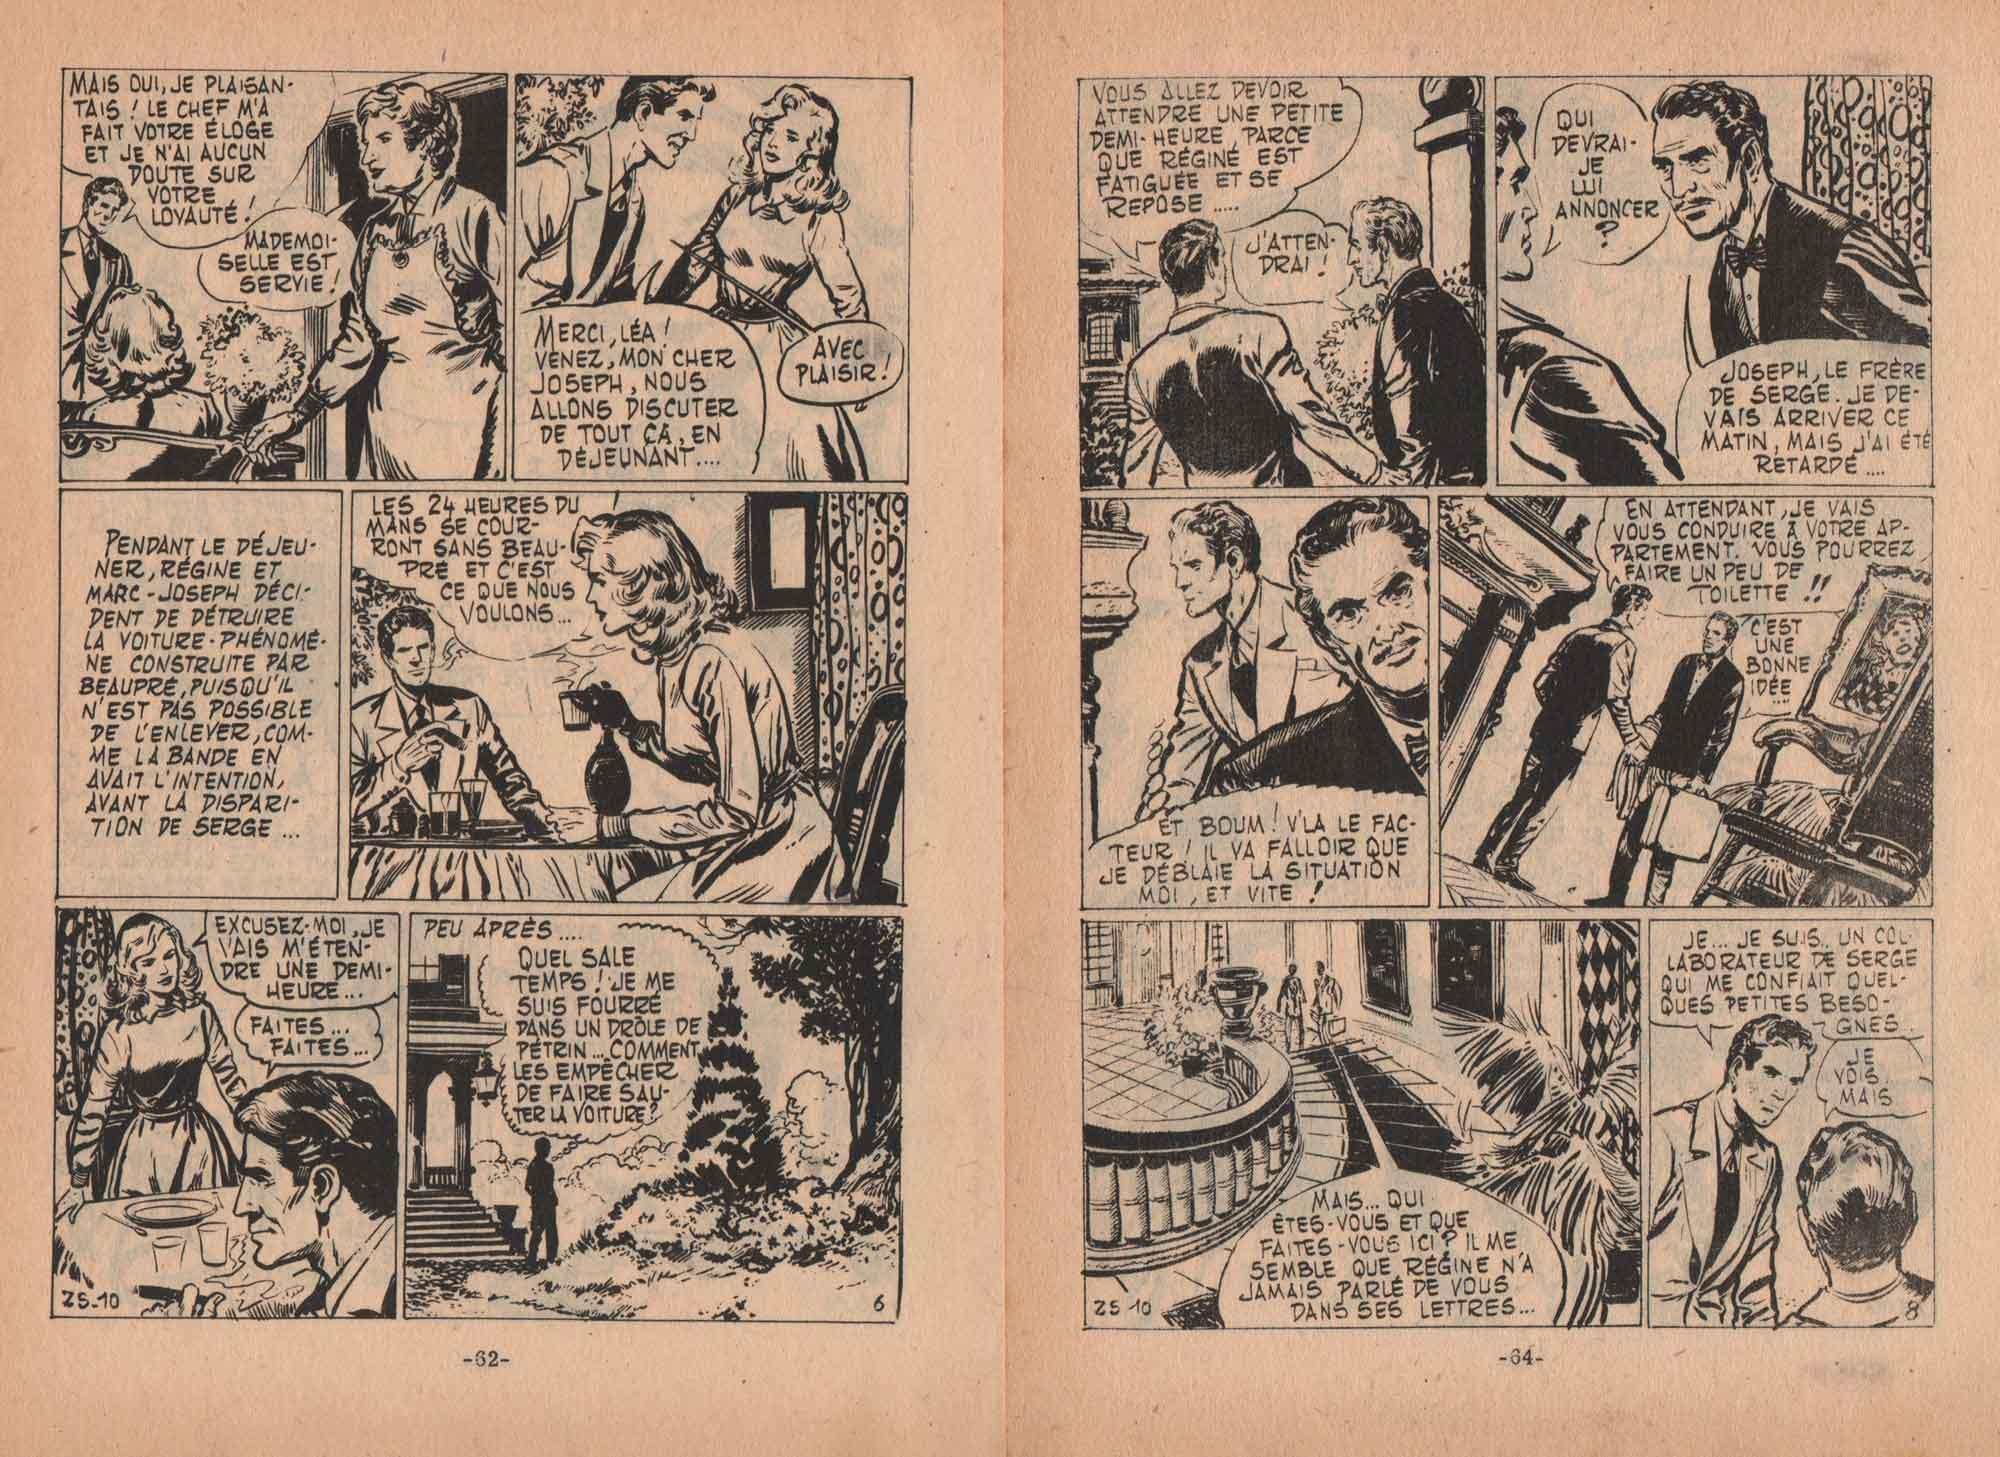 « Quel sale temps ! » Zorro spécial n° 10 (09/1960).